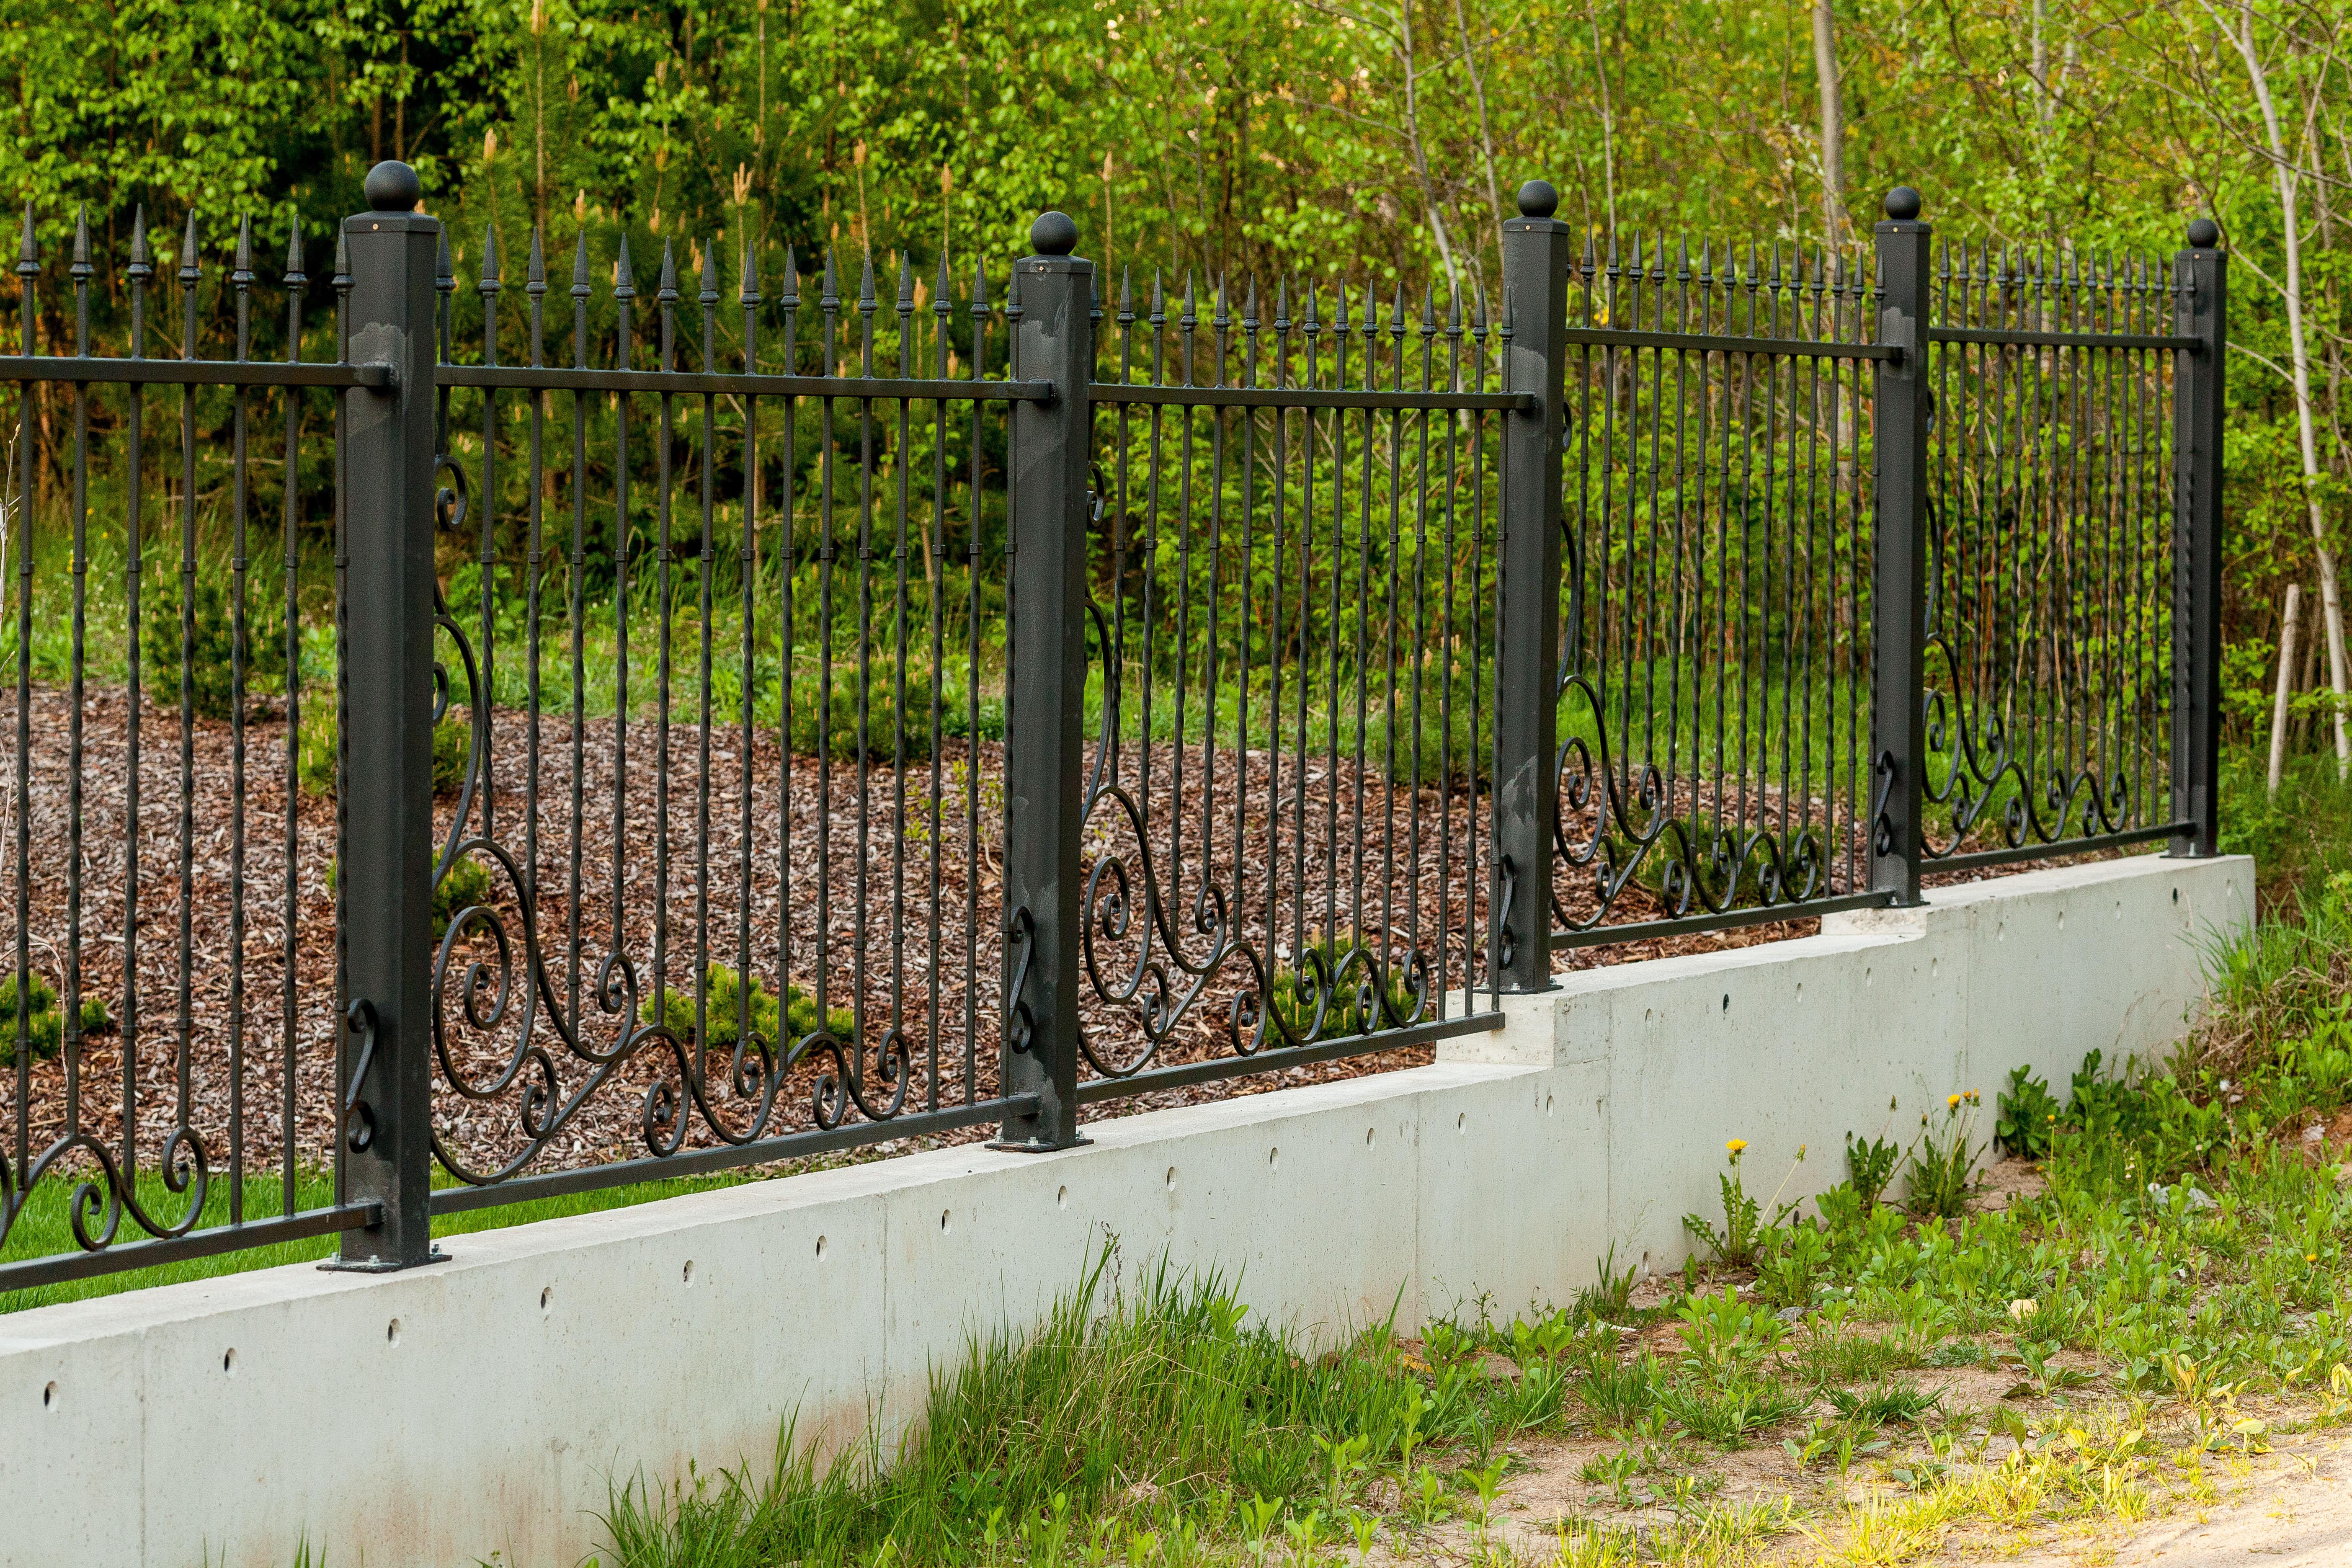 Kokybiškos tvoros